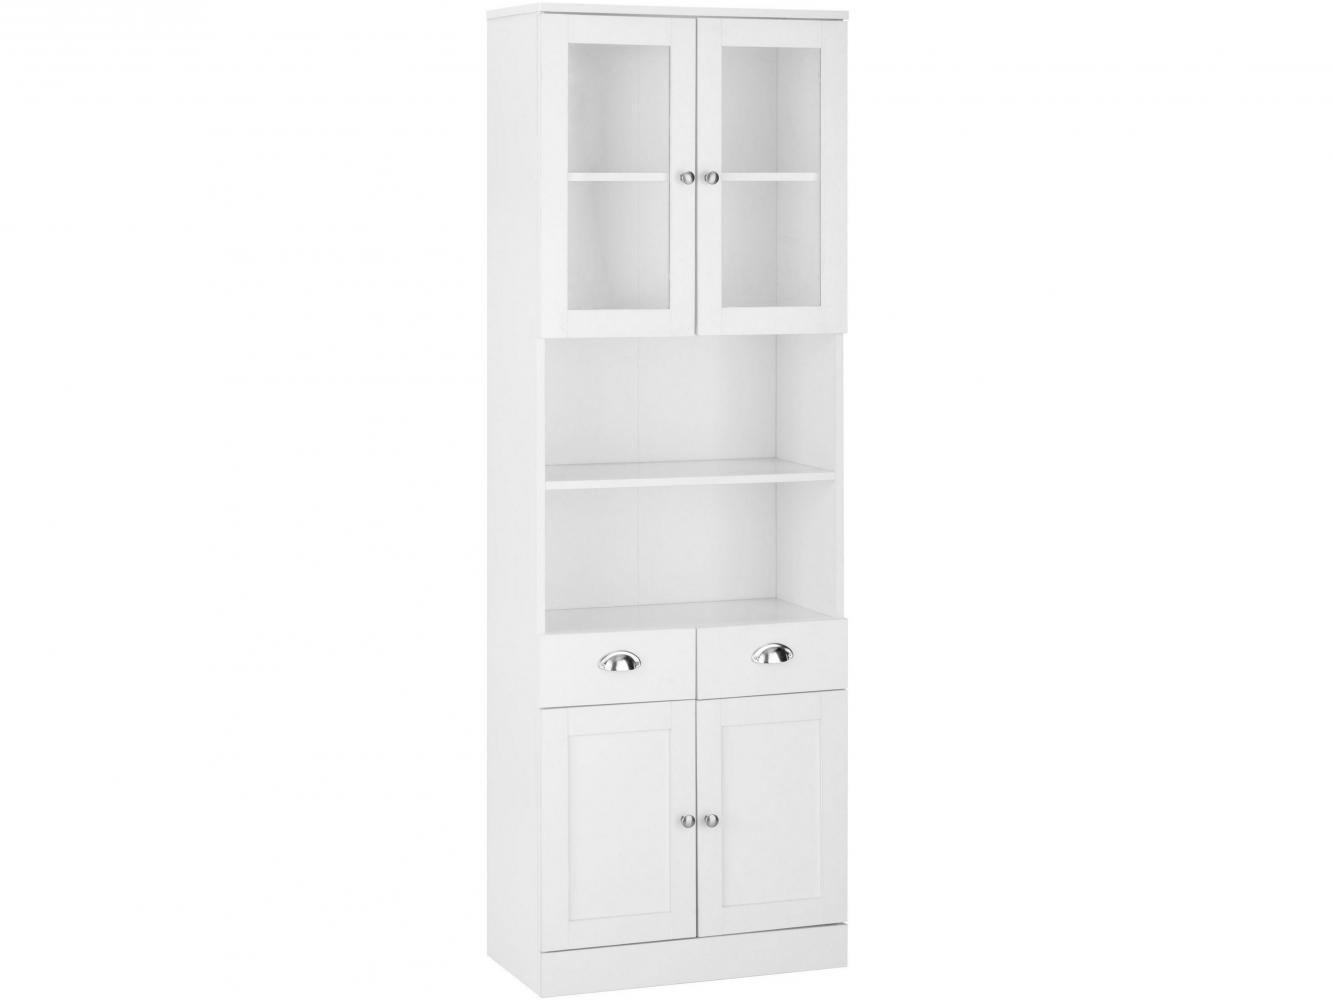 Koupelnová skříňka Kiley II., 180 cm, bílá